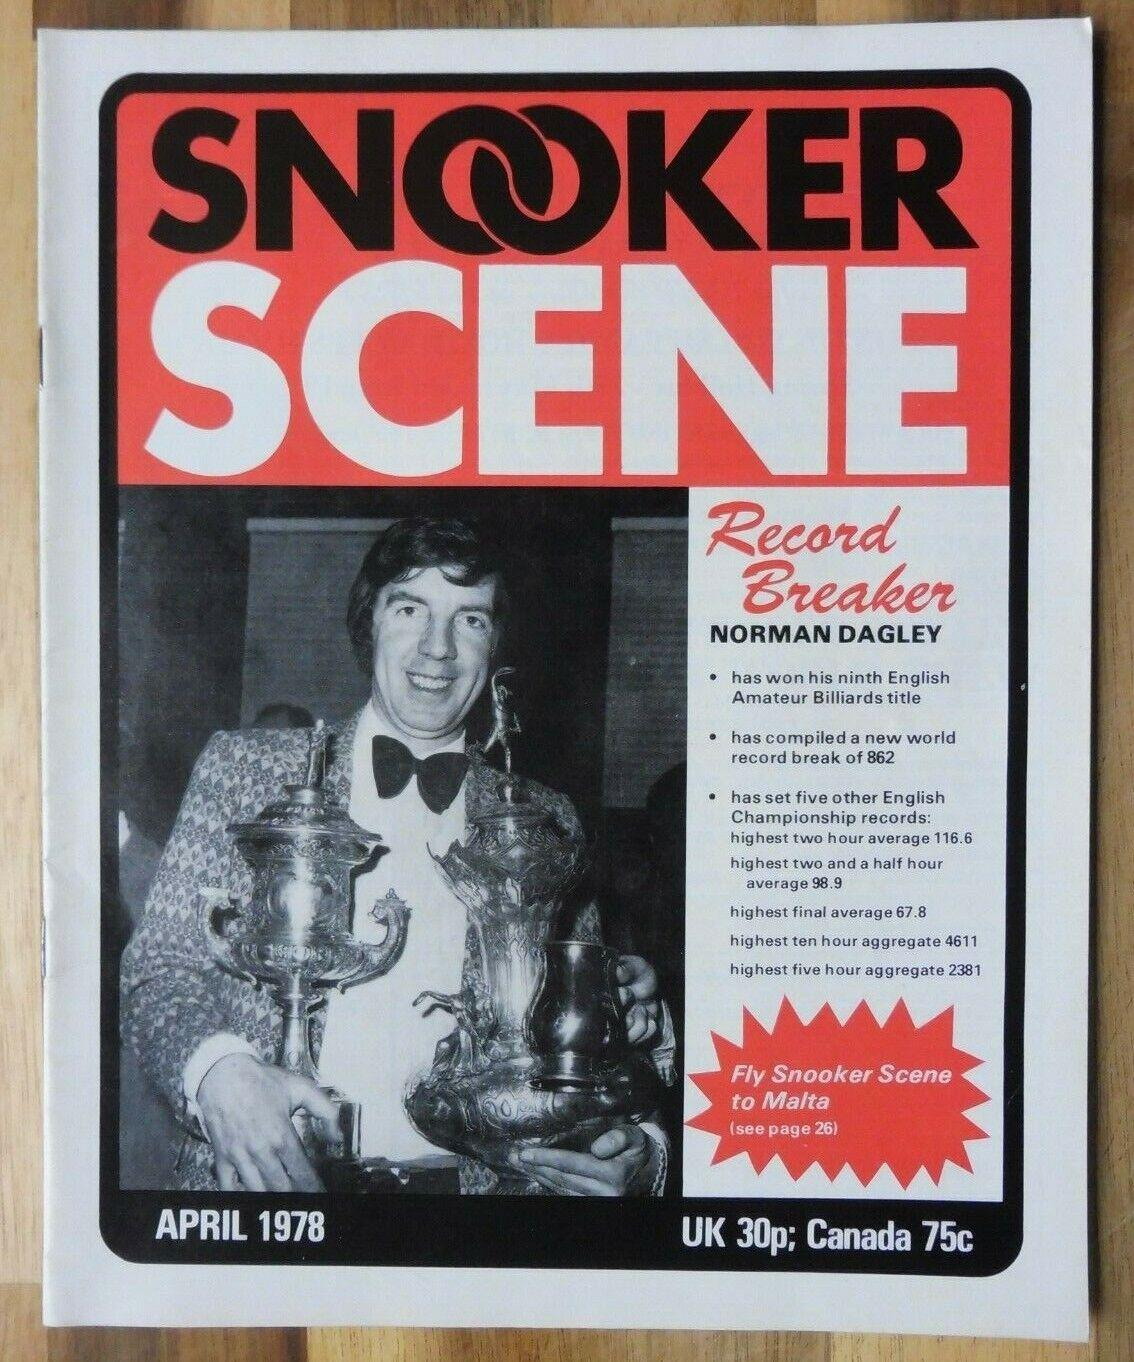 Snooker Scene Magazine, April 1978, Good Condition.